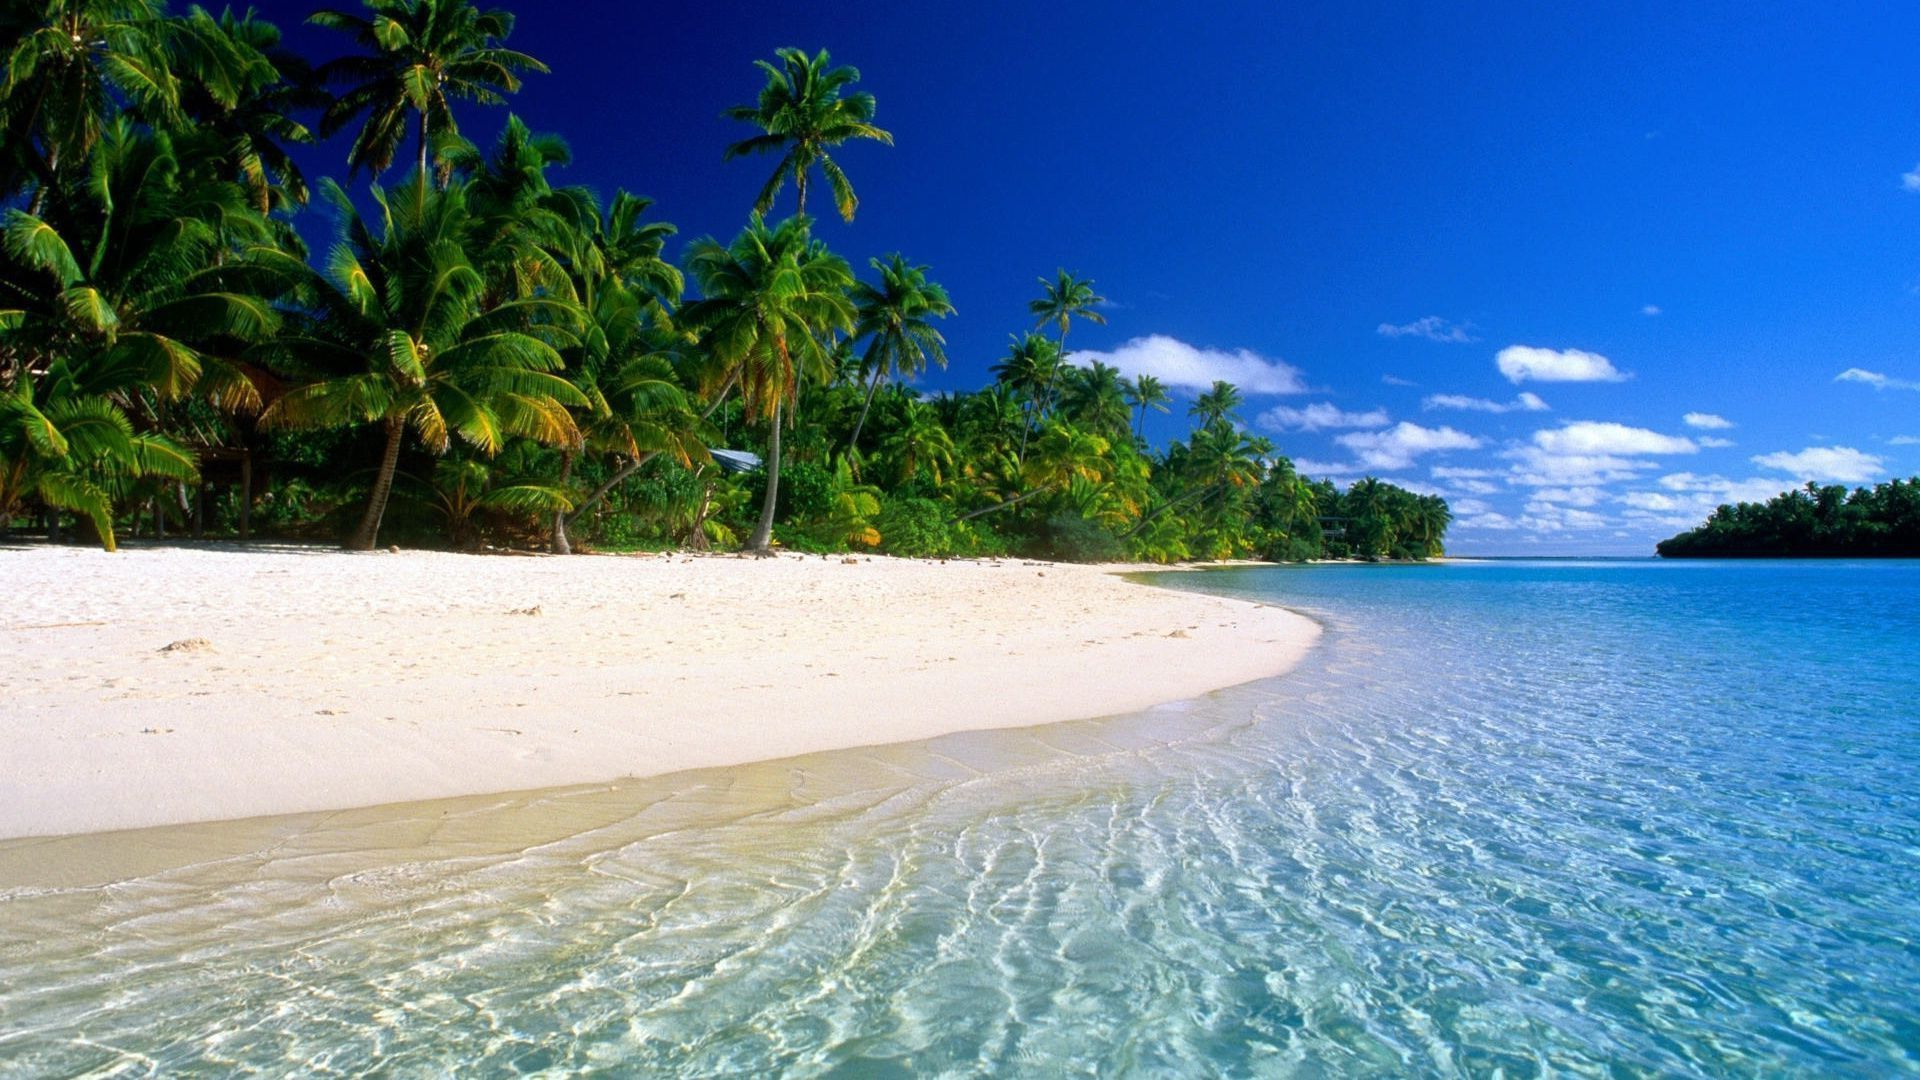 Hd Beach Desktop Wallpapers Top Free Hd Beach Desktop